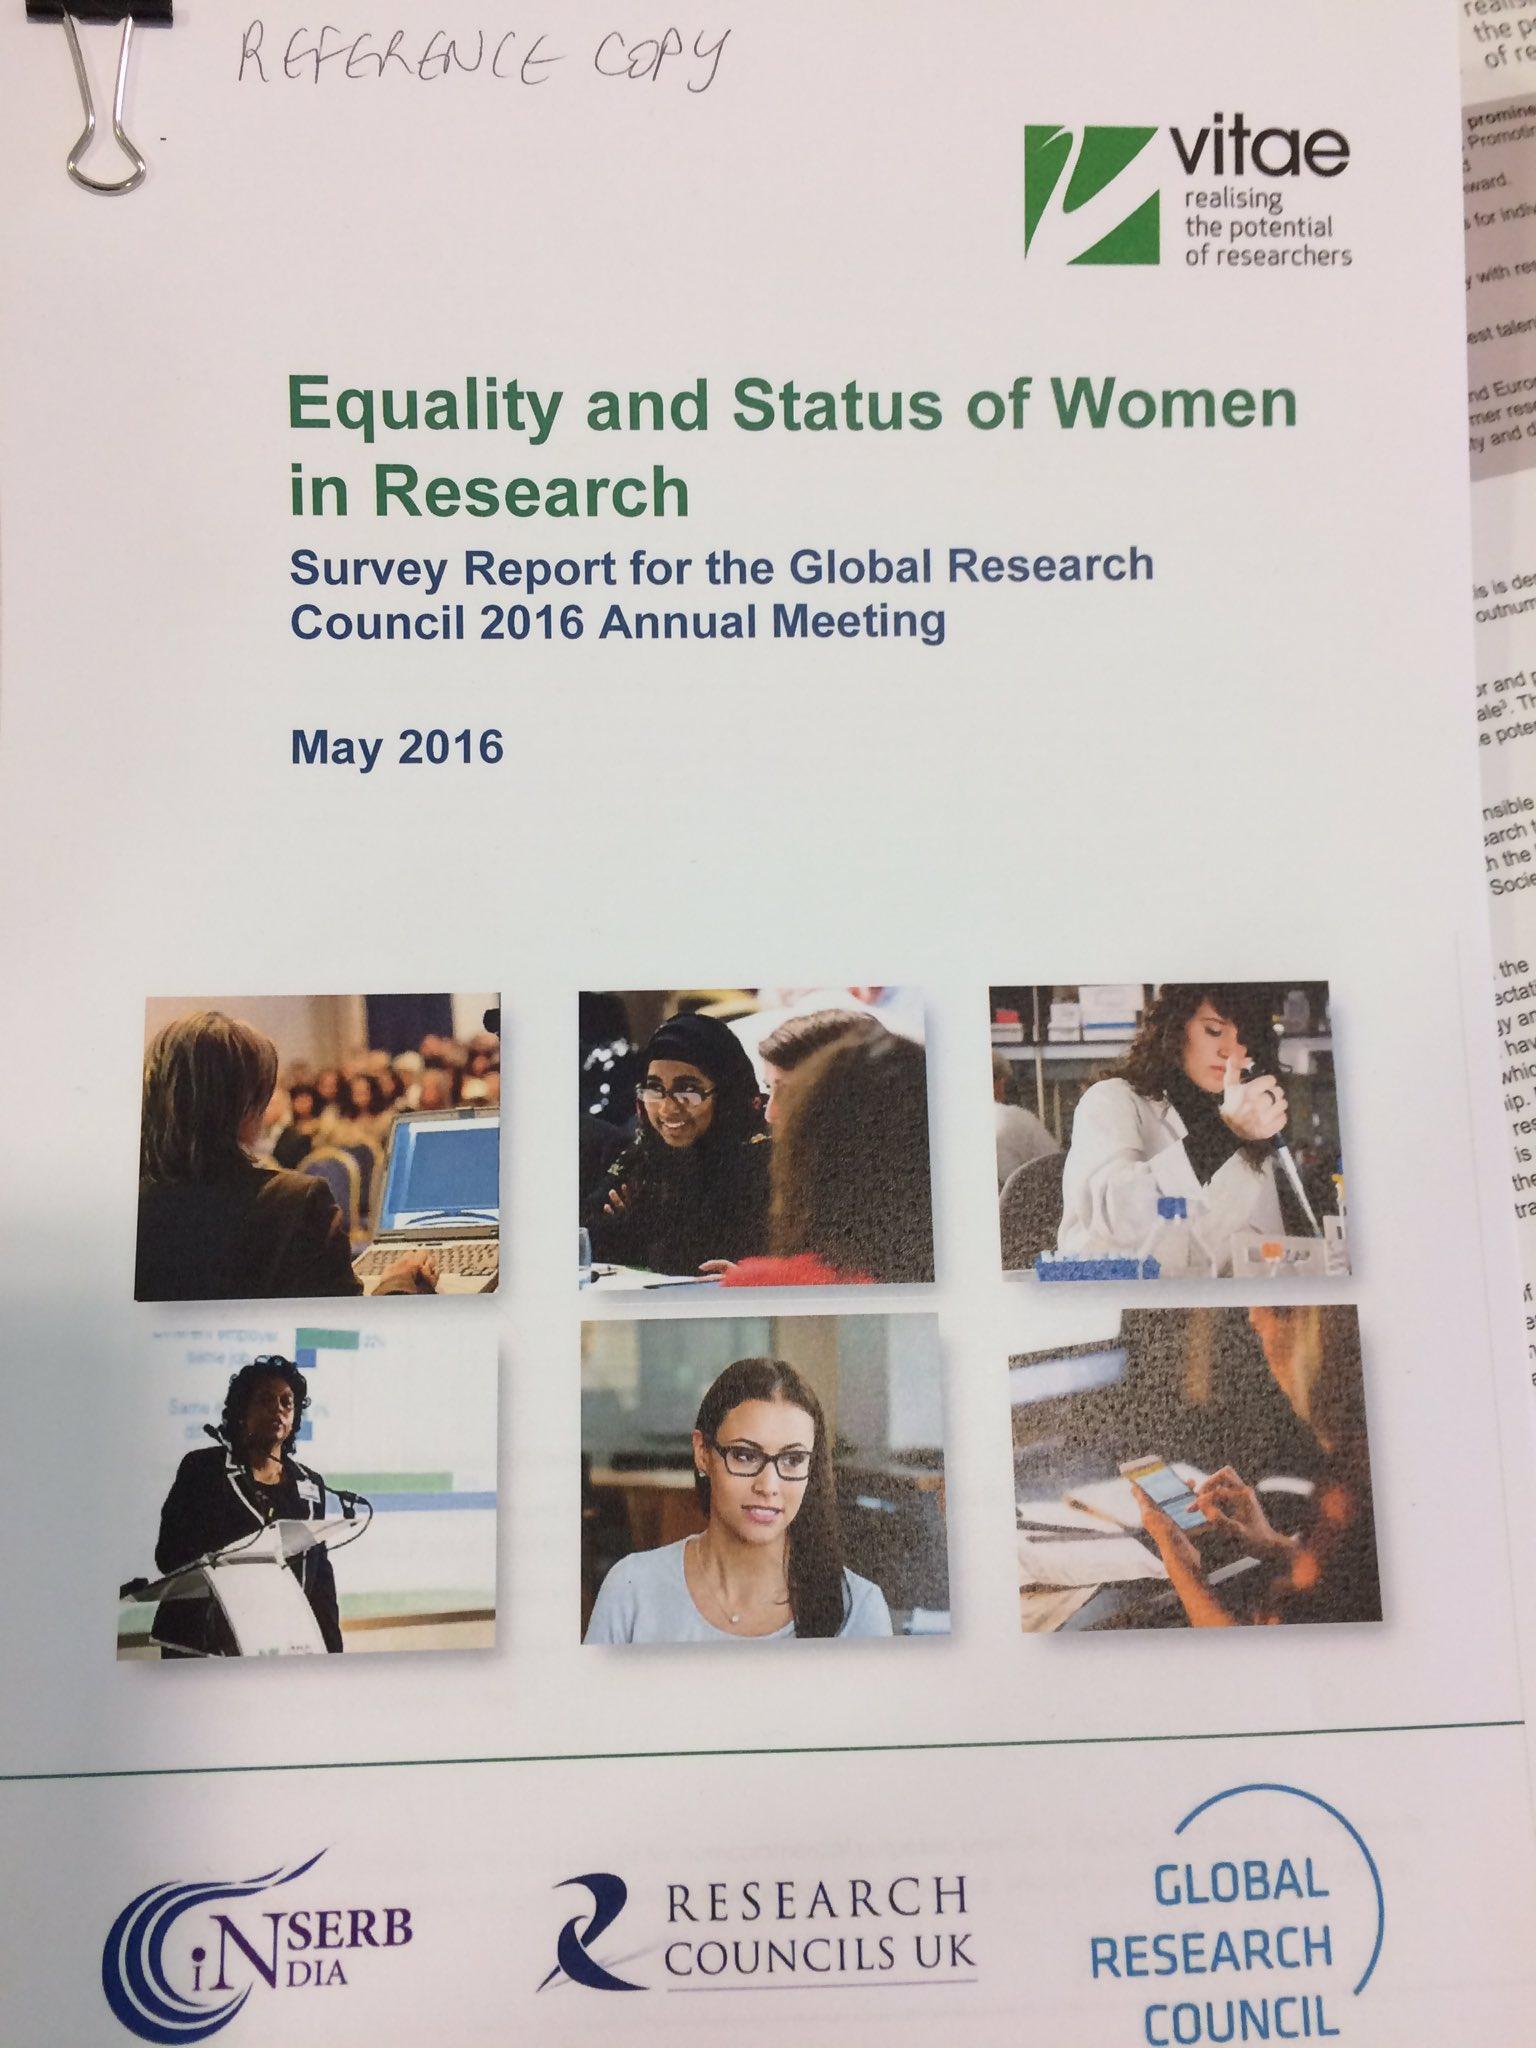 Thumbnail for Establishing parity for BME researchers #vitae17